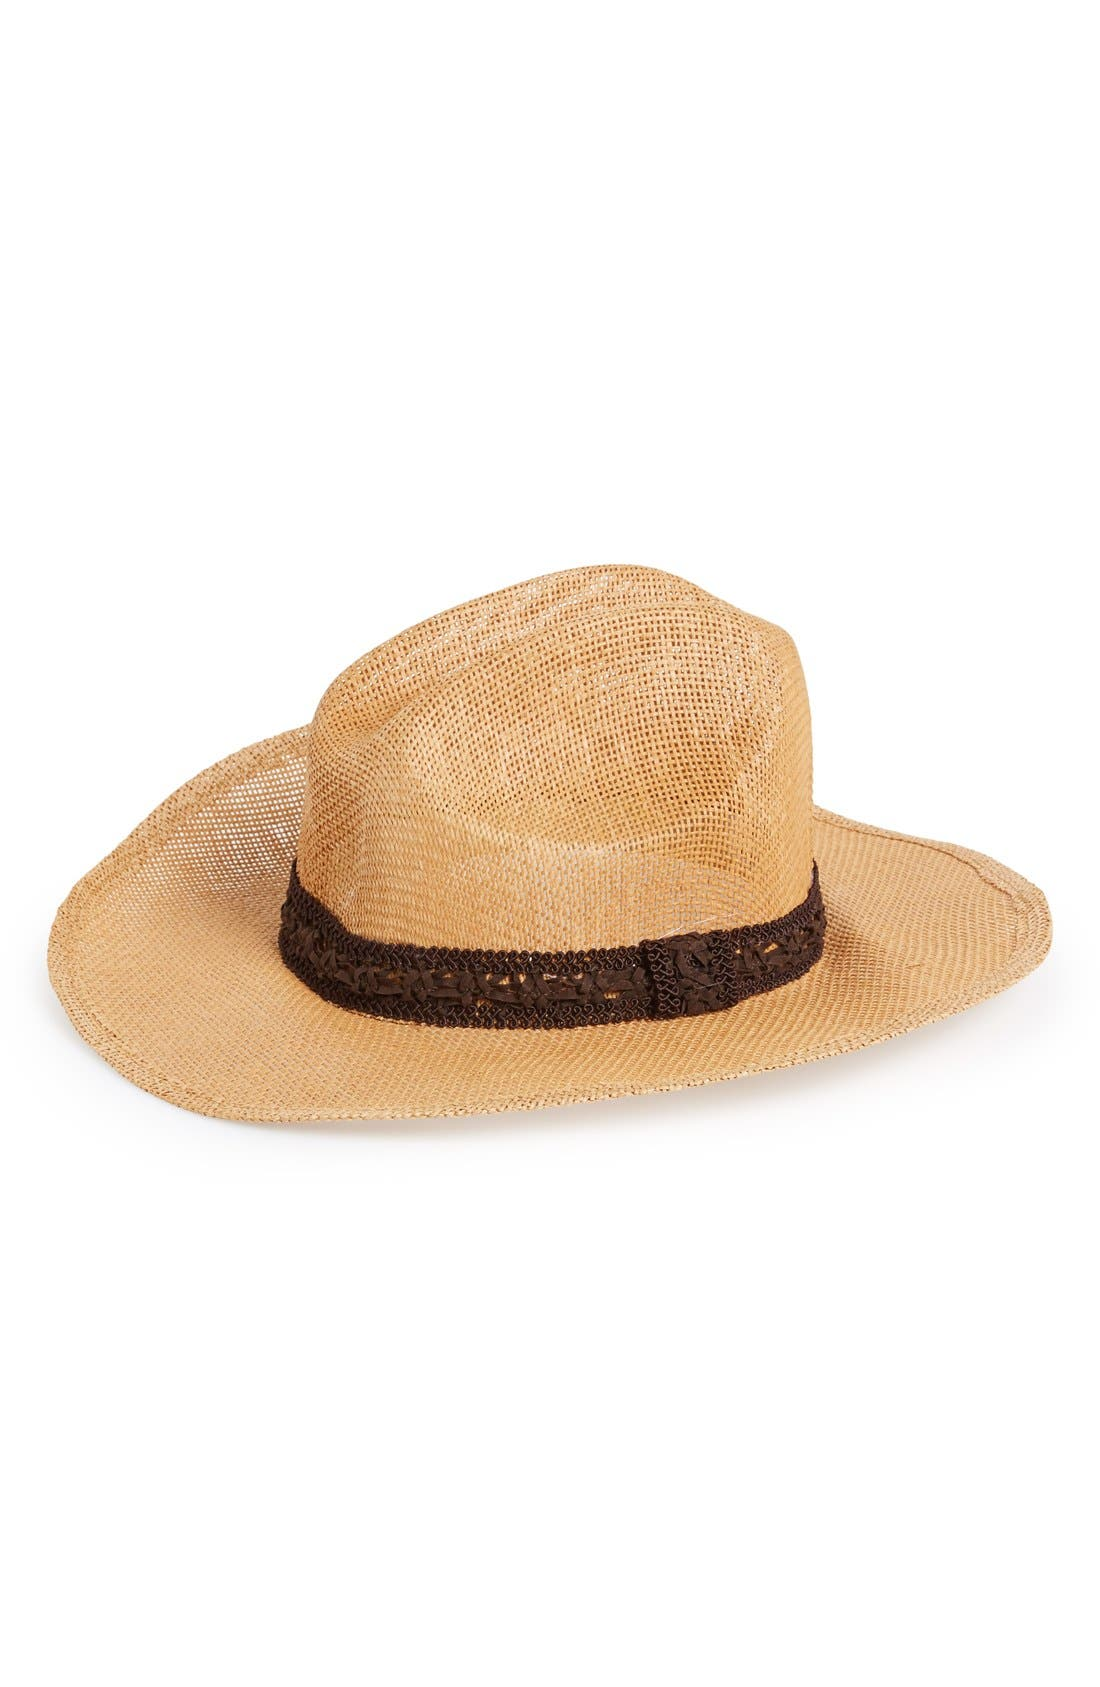 Main Image - Amici Accessories Straw Cowboy Hat (Juniors)